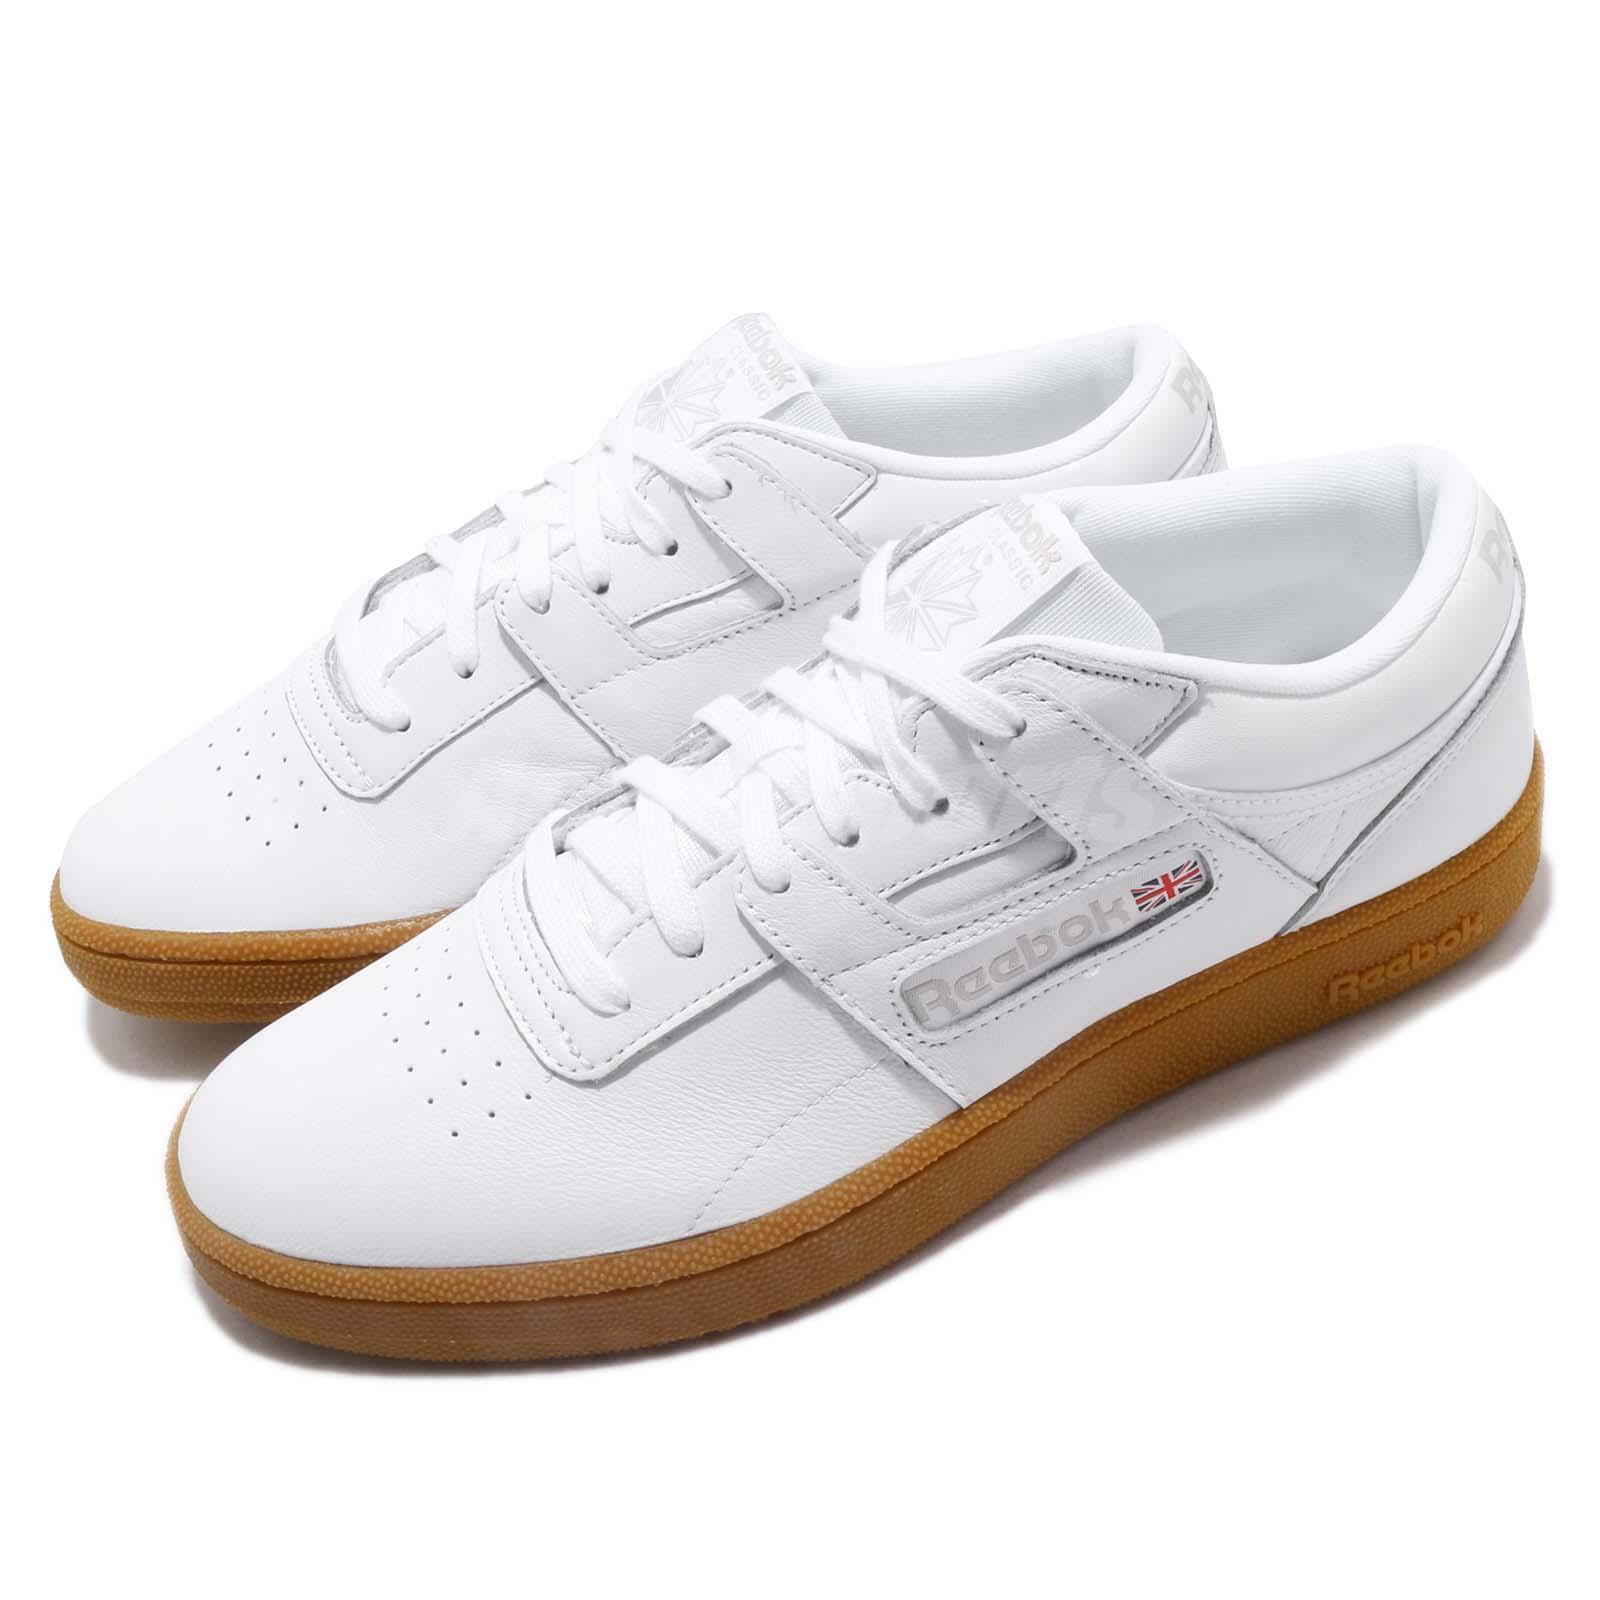 Reebok Club Workout MU blanco Skull gris Gum Men Casual zapatos zapatillas CN5076